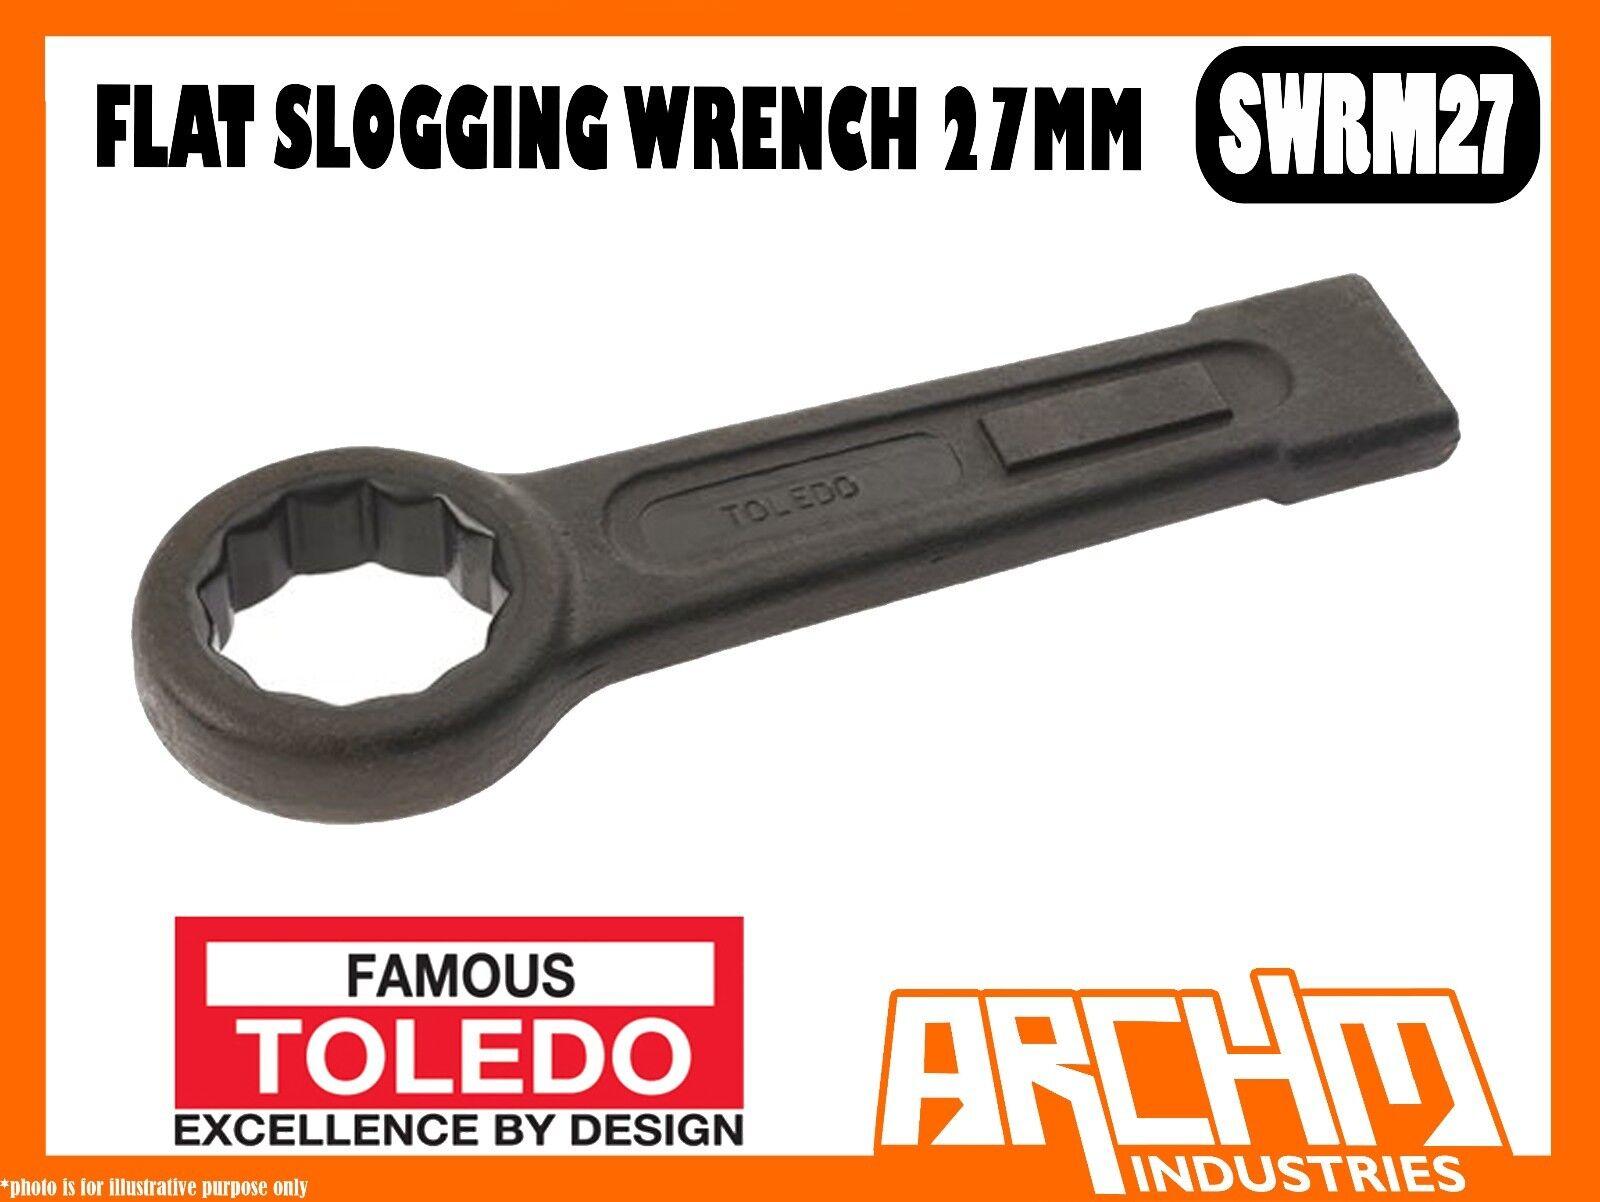 TOLEDO SWRM27 - FLAT SLOGGING WRENCH -  27MM - METRIC